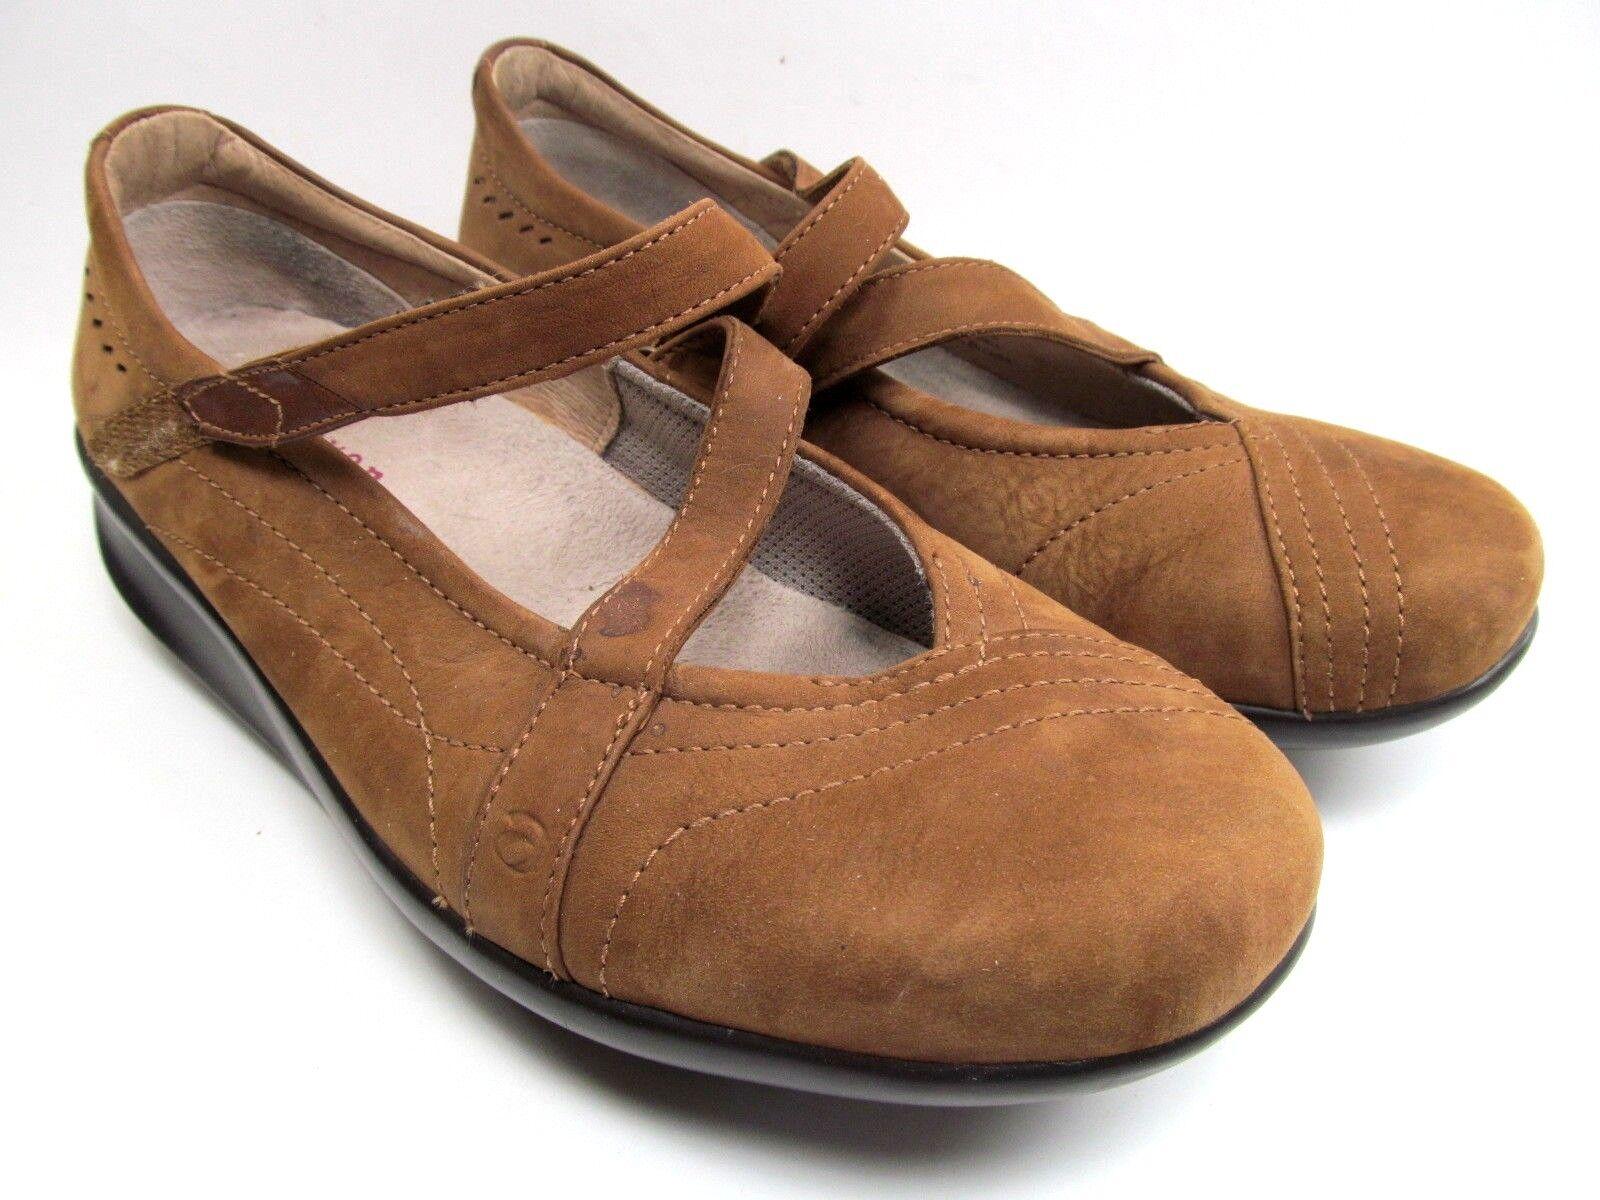 Aravon by New Balance Womens Mary Jane Shoe 9.5 B Rocker Sole Combination Last